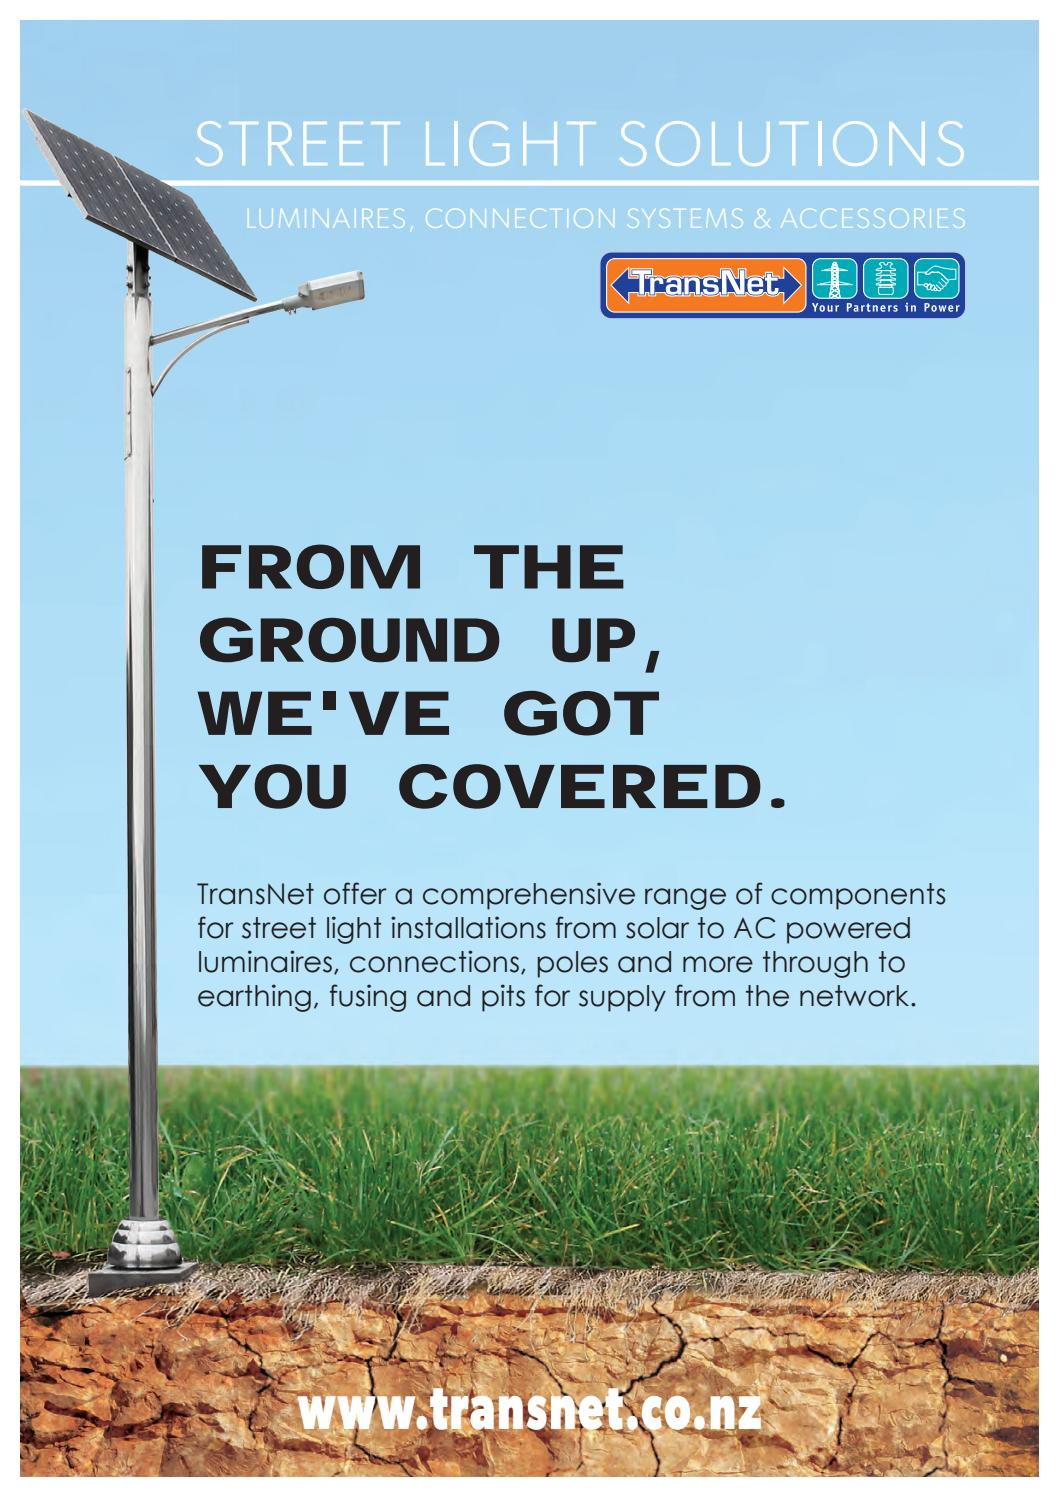 Street Lighting Solutions by TransNet NZ Ltd - issuu